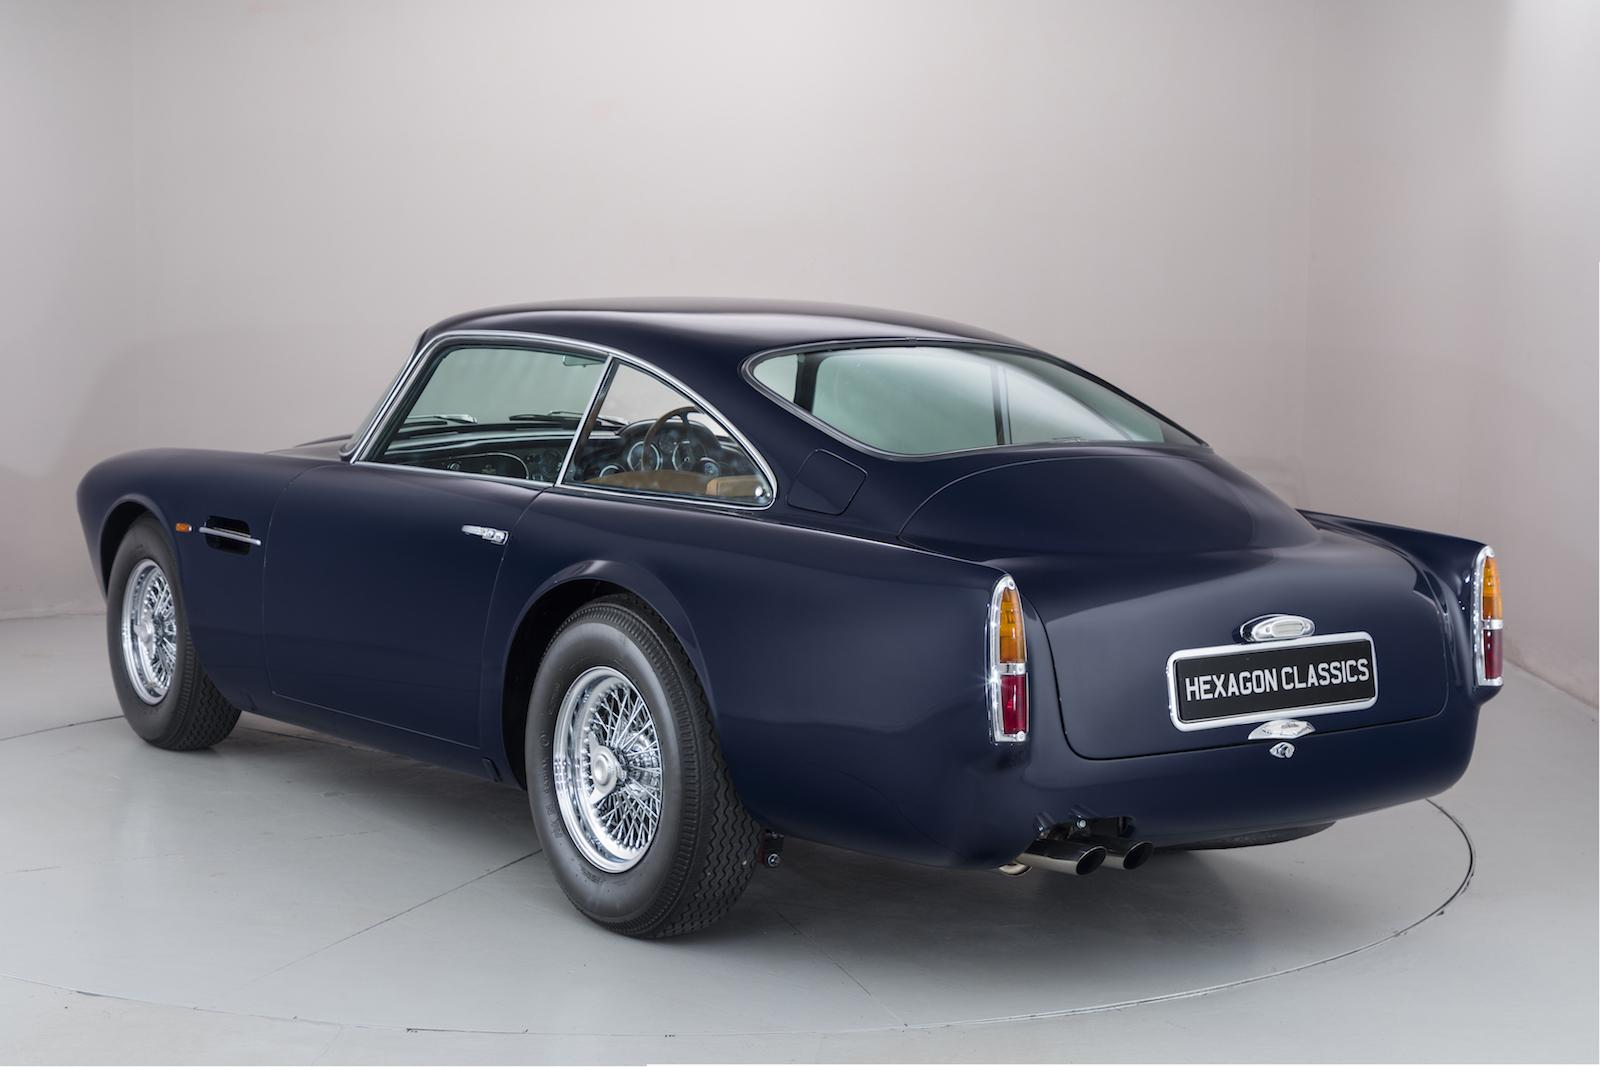 Rare pre-production Aston DB4 goes on sale in London | Autoclassics.com